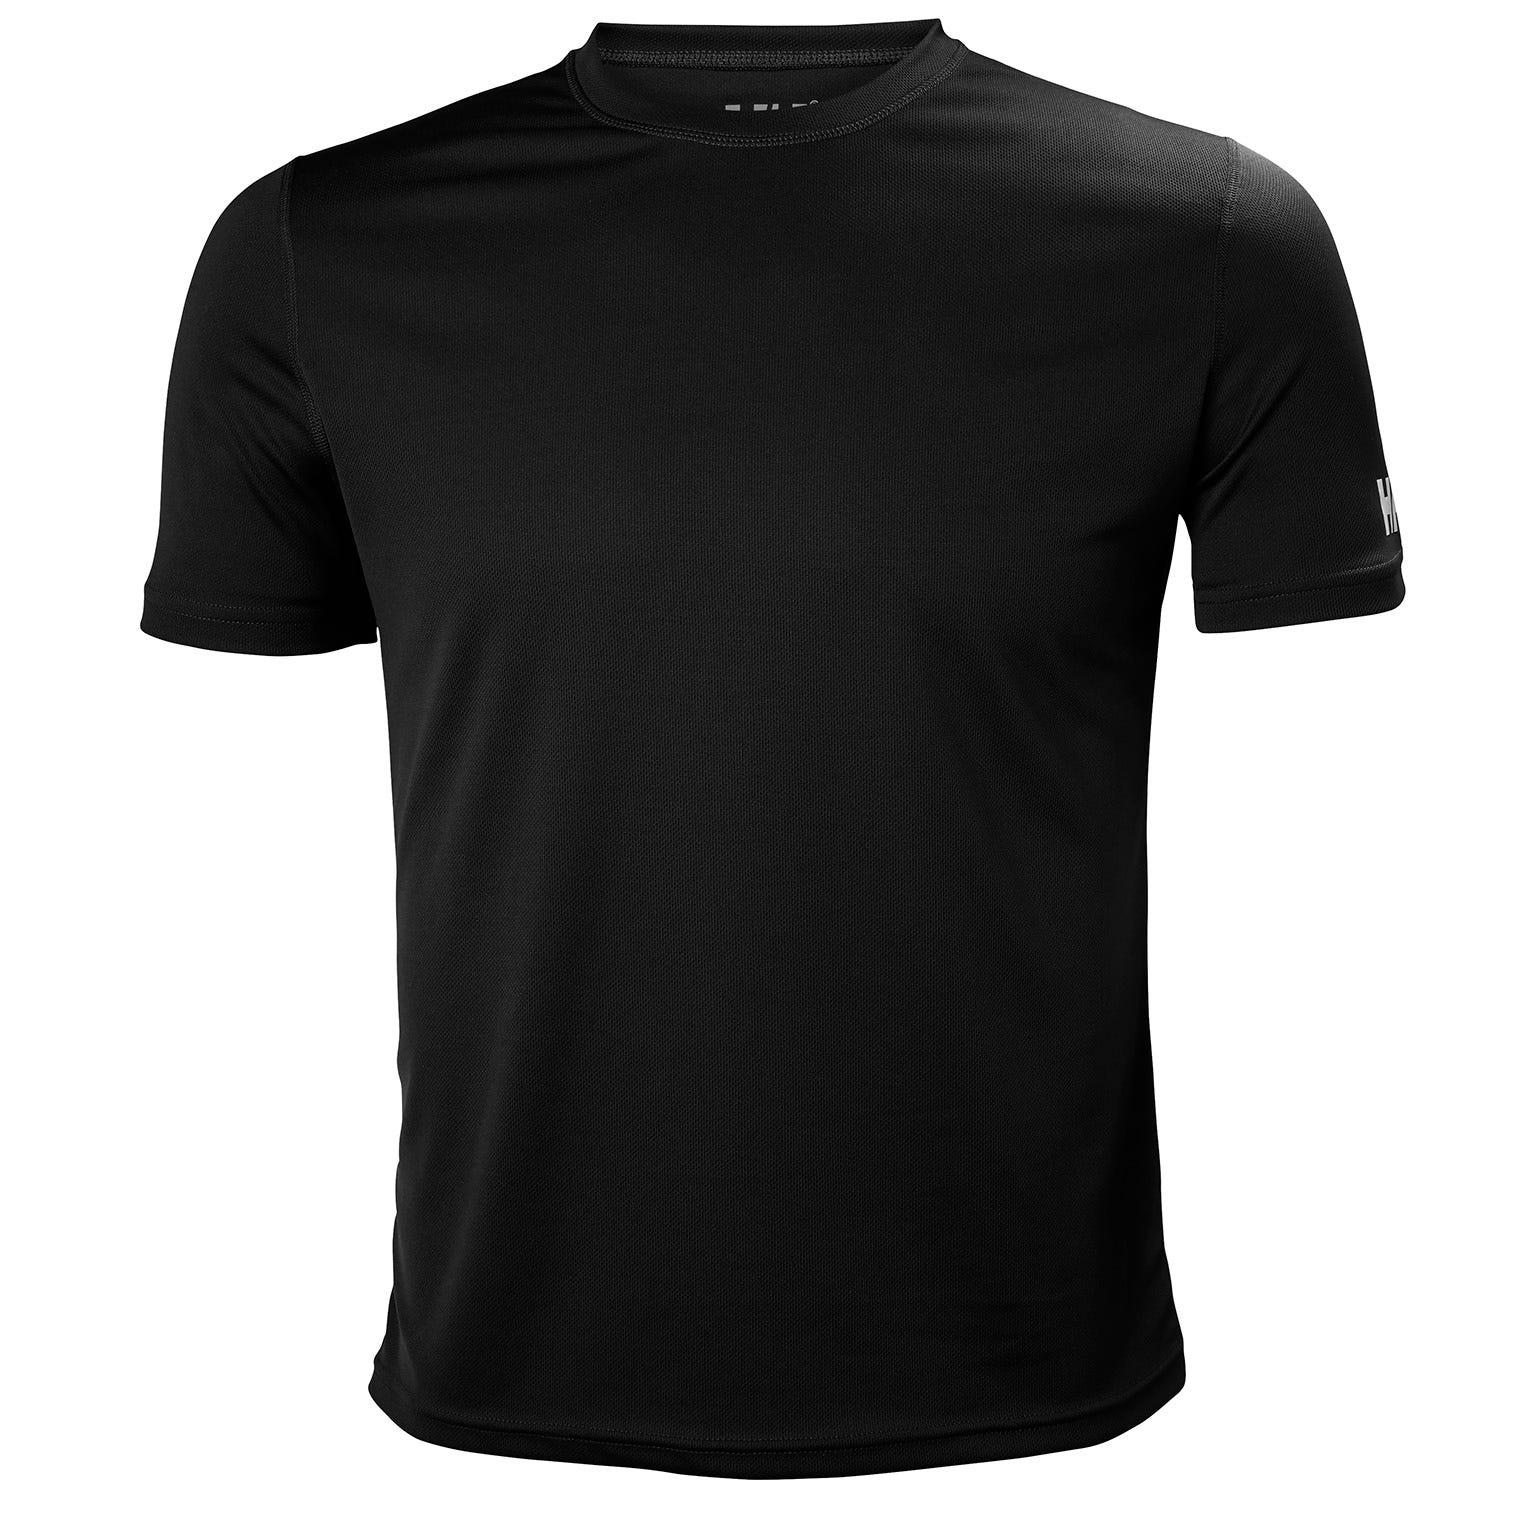 e0f497a0c93 Helly Hansen Mens Tech Tshirt Baselayer Black L